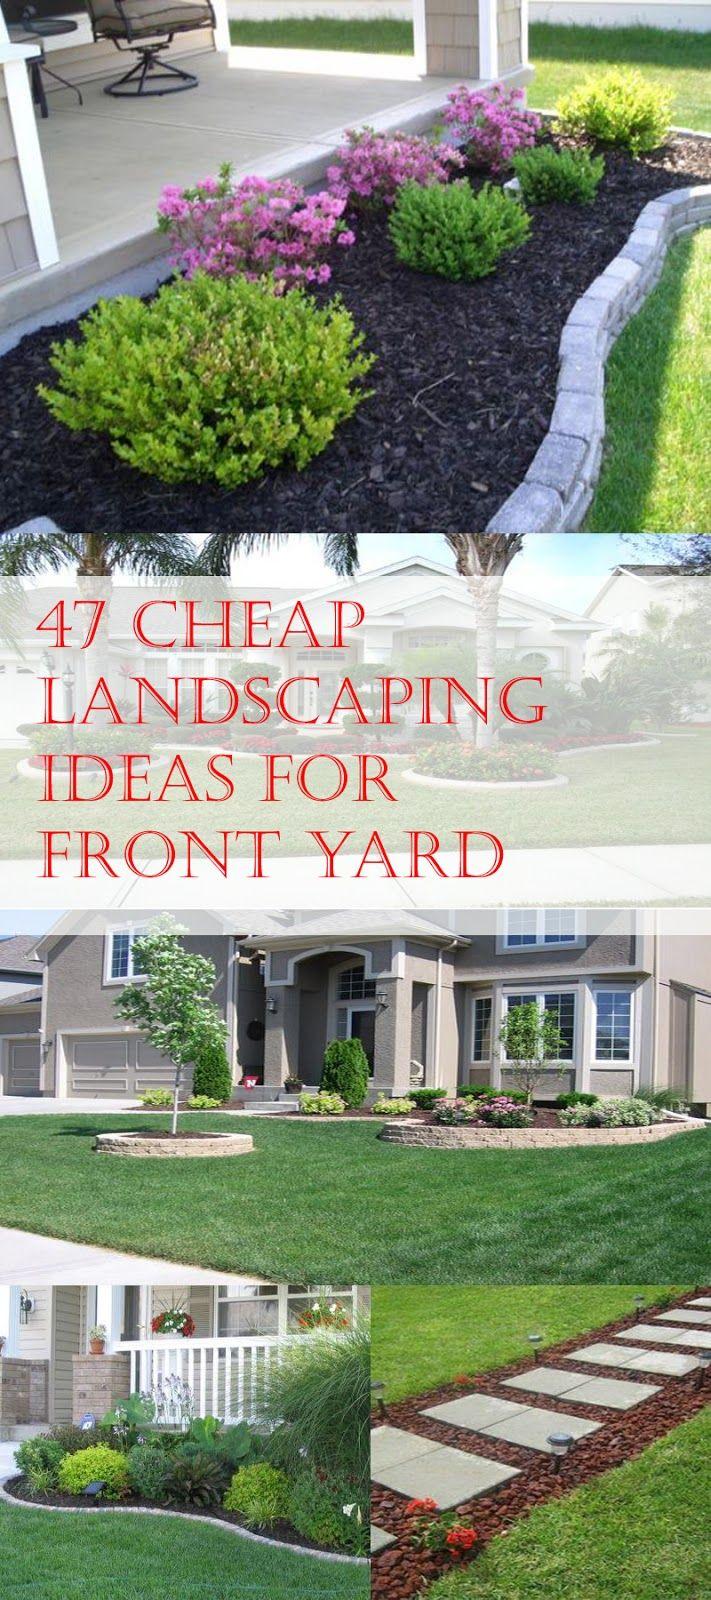 47 Cheap Landscaping Ideas For Front Yard #smallfrontyardlandscapingideas